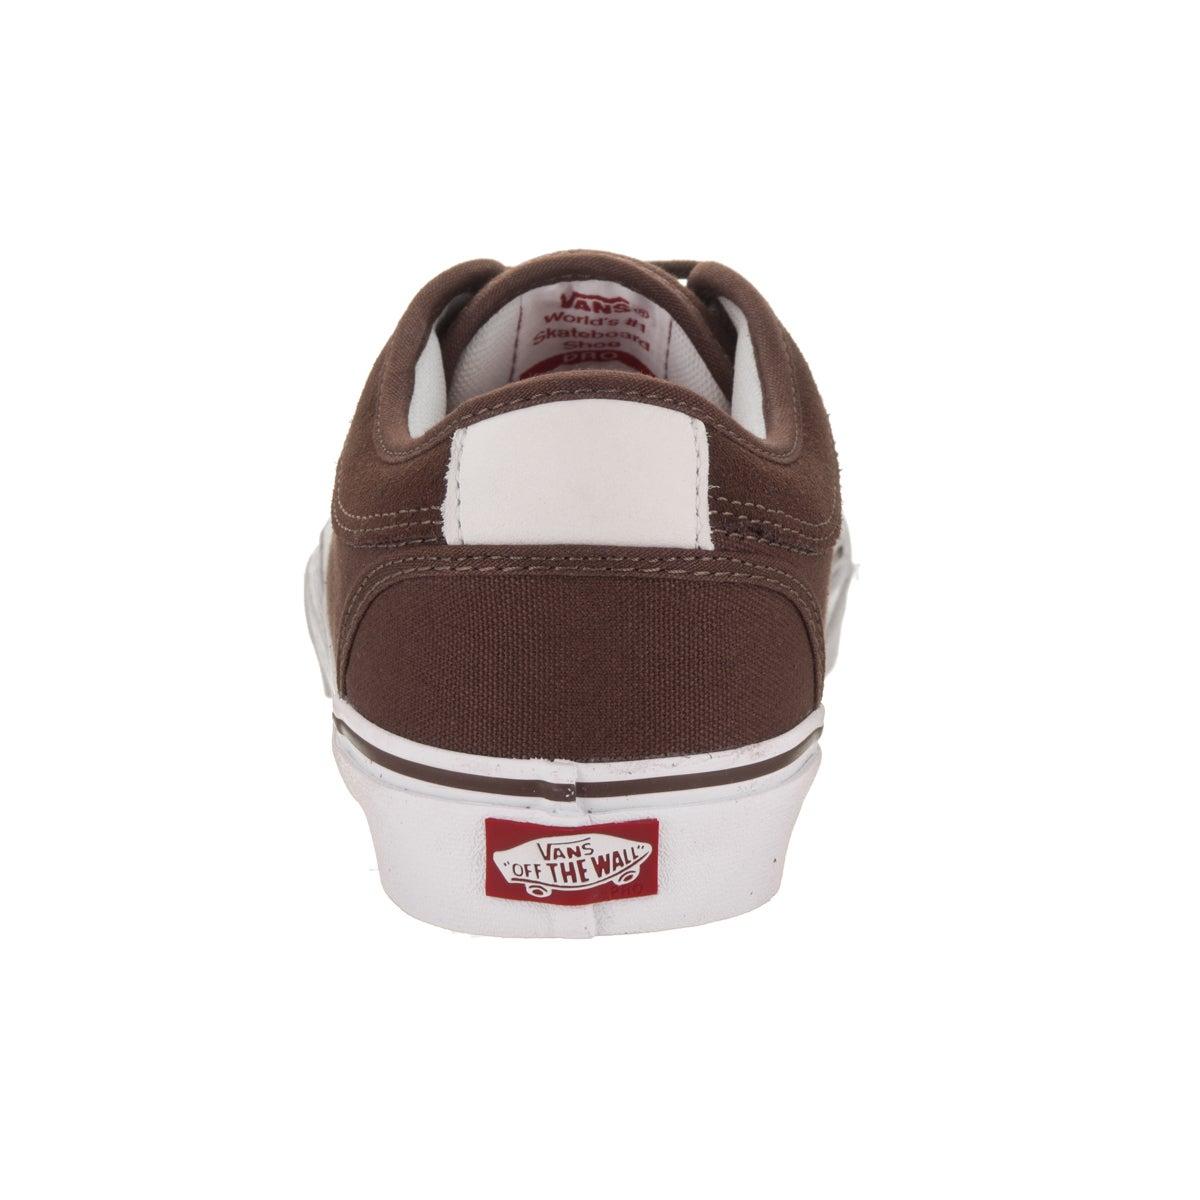 2e4a3e2dc5ba Shop Vans Men s Chukka Low Brown Suede Skate Shoes - Free Shipping Today -  Overstock - 14457979